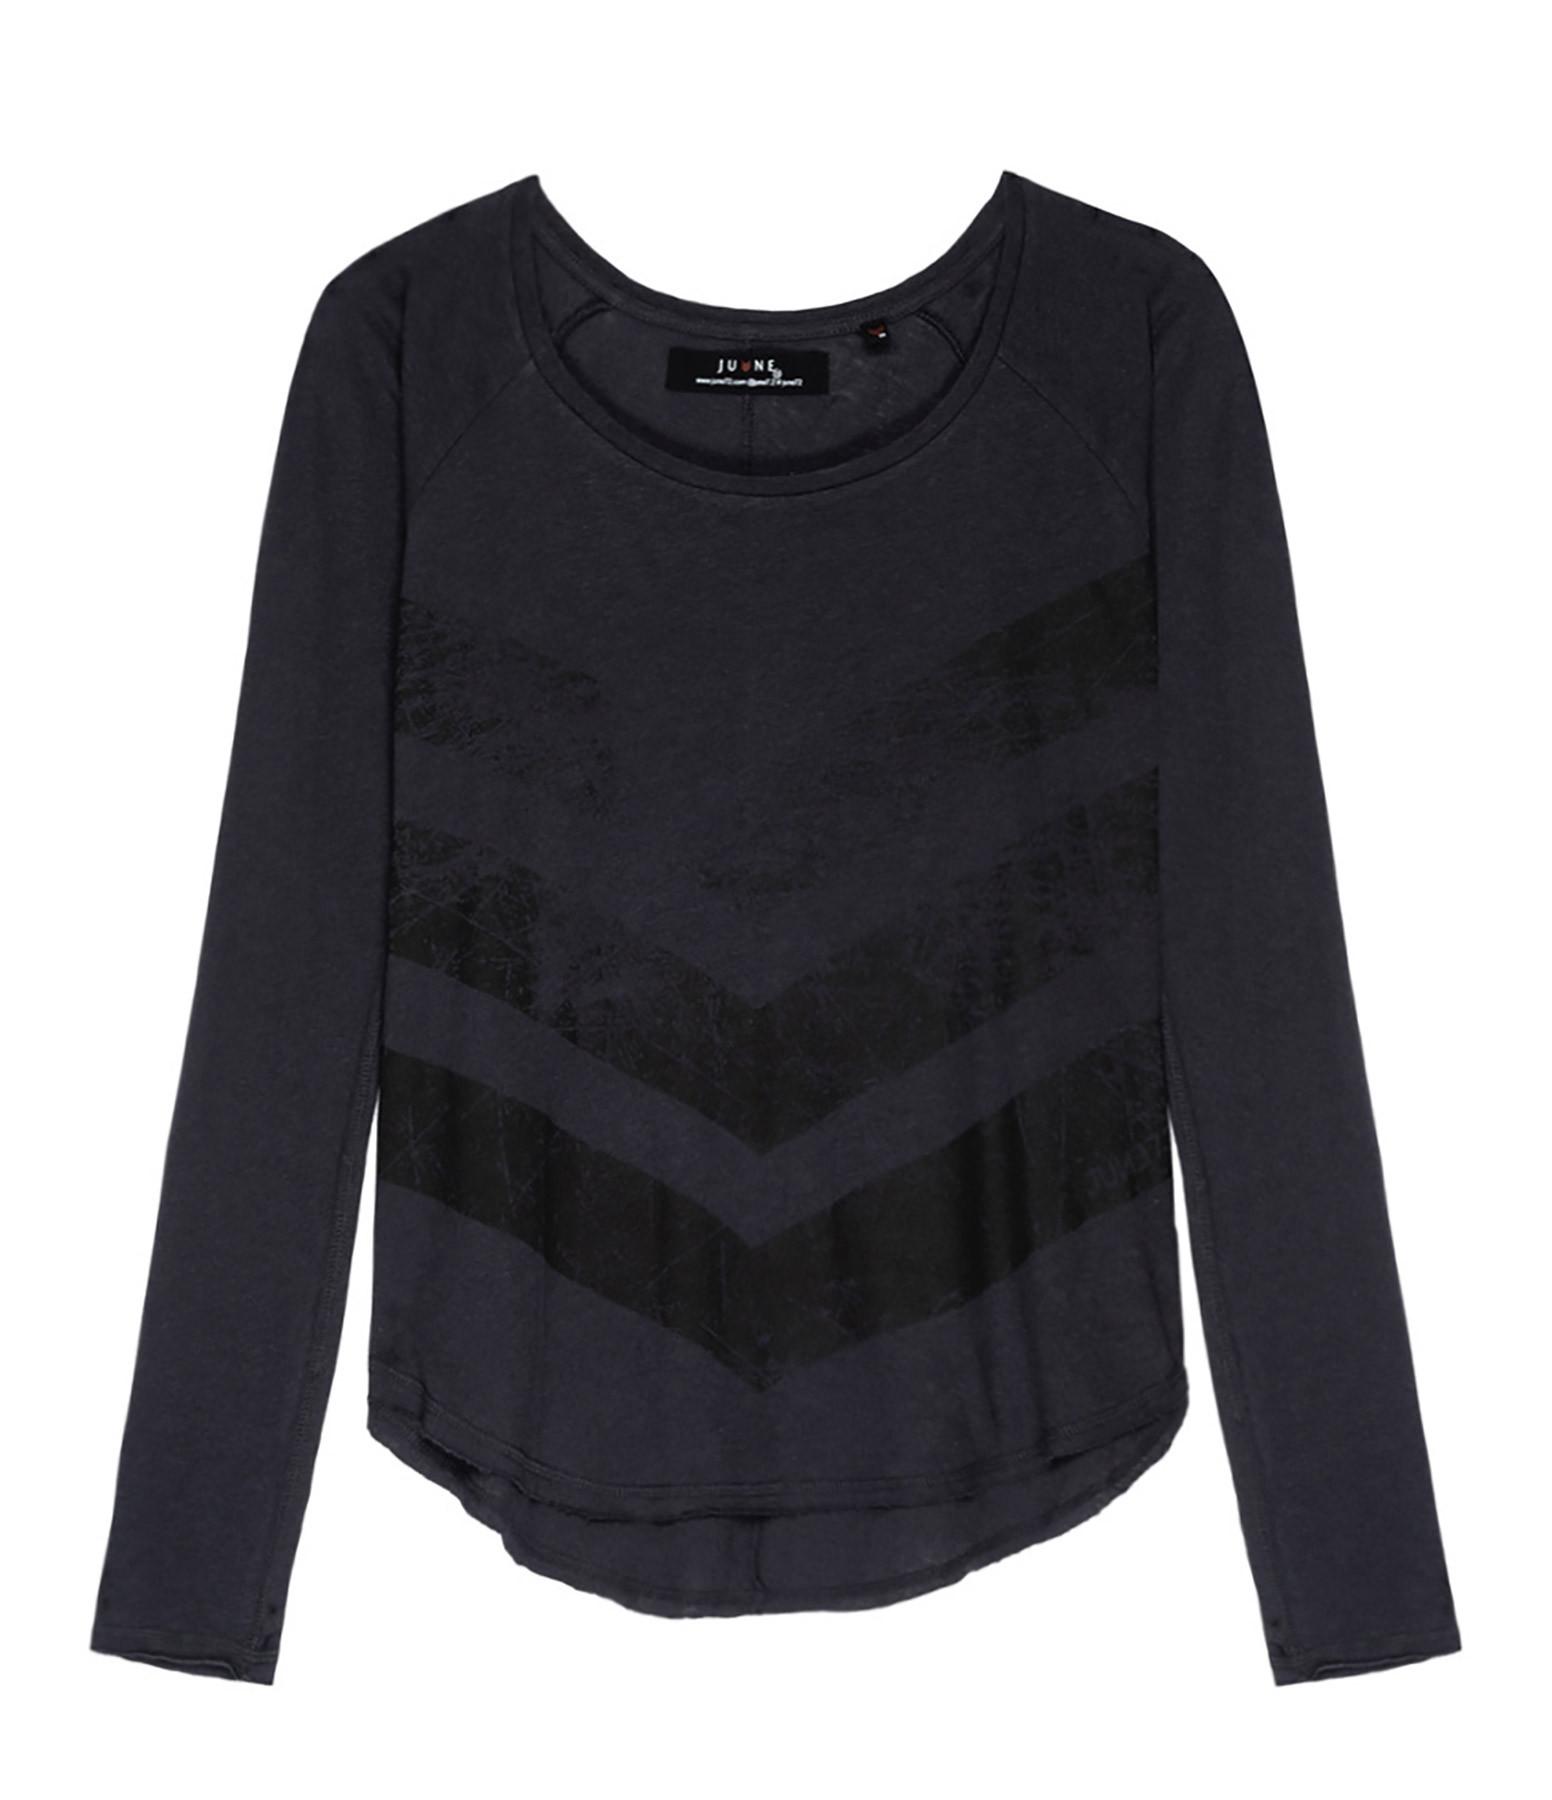 JUNE 7.2 - Tee-shirt Katya Coton Lin Charbon Logo Noir